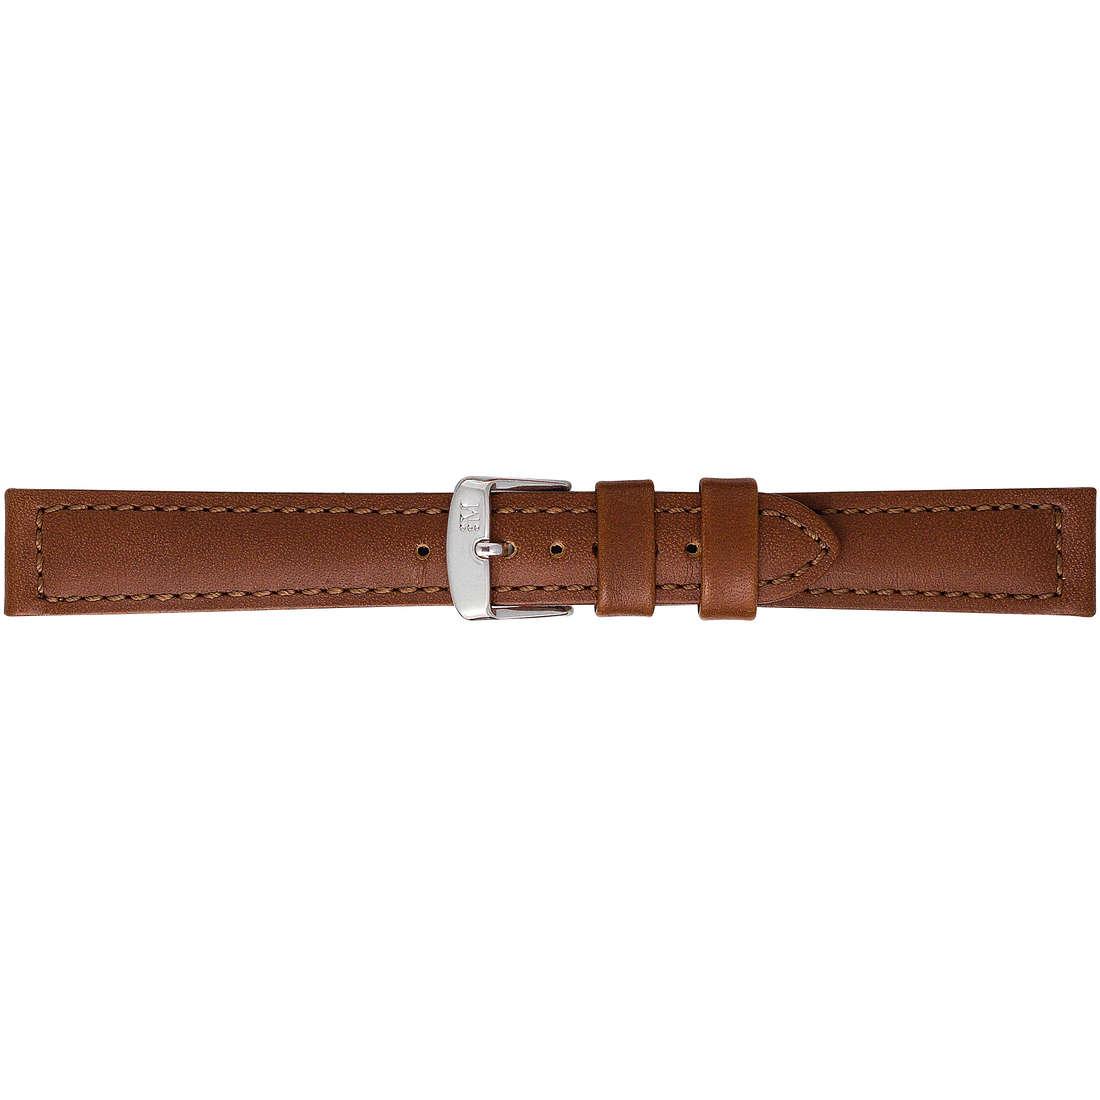 watch watch bands watch straps man Morellato Manufatti A01U2226364034CR18